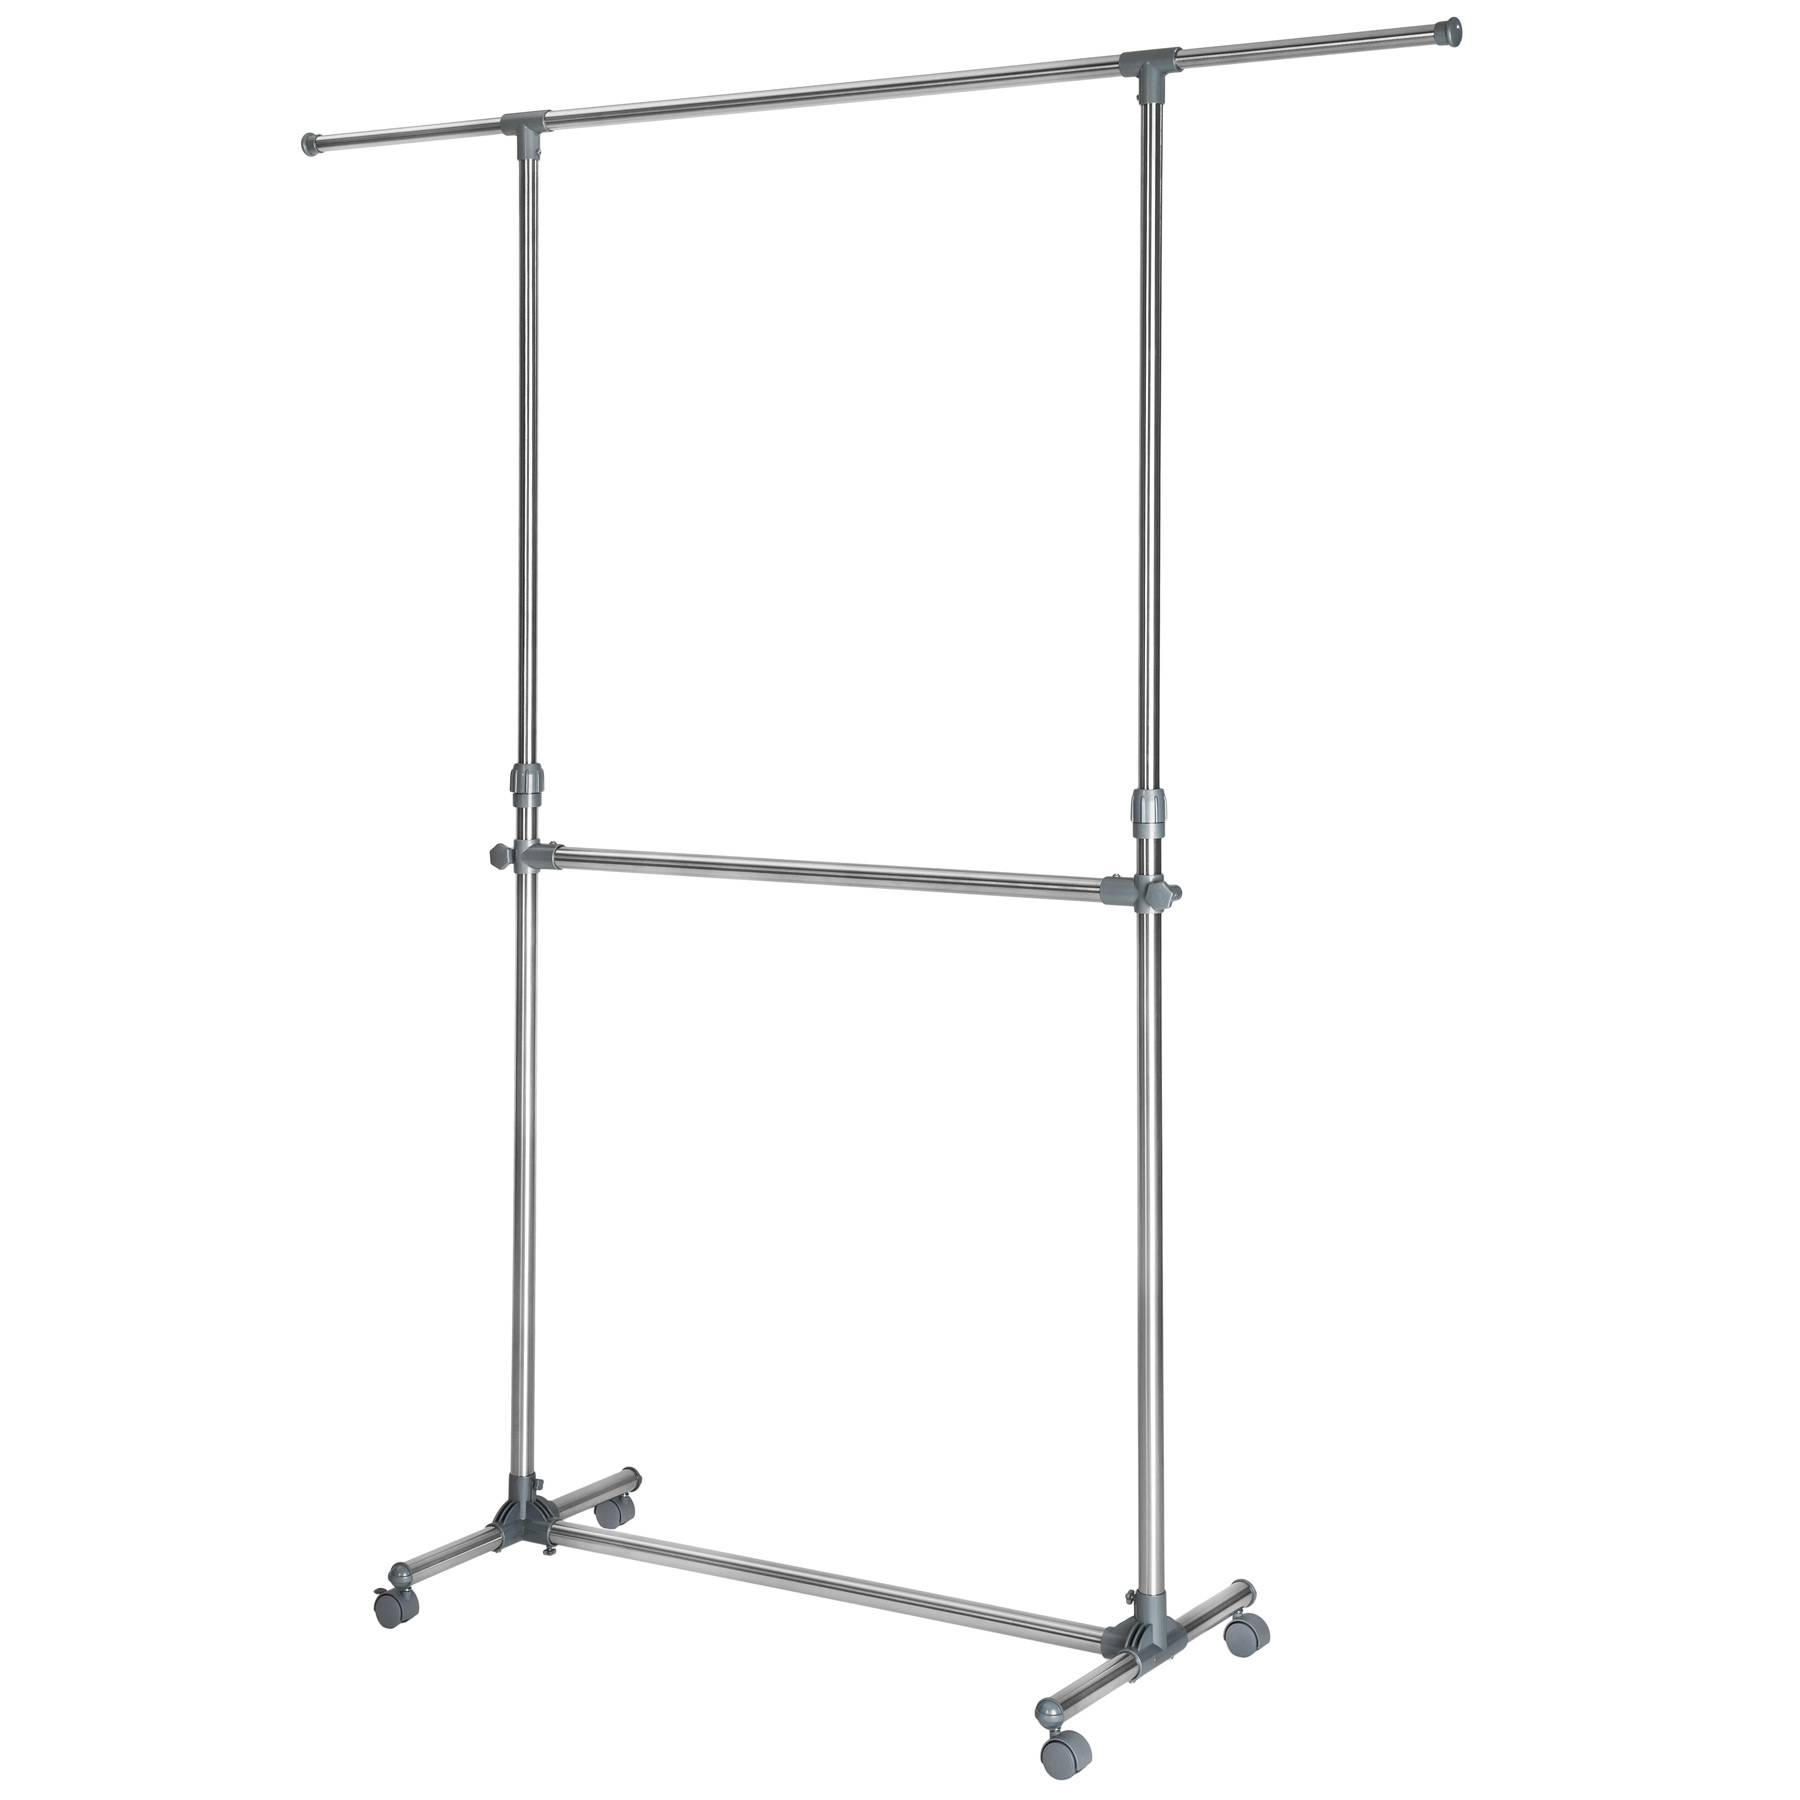 tectake Clothes rack 165x48x200 cm - grey